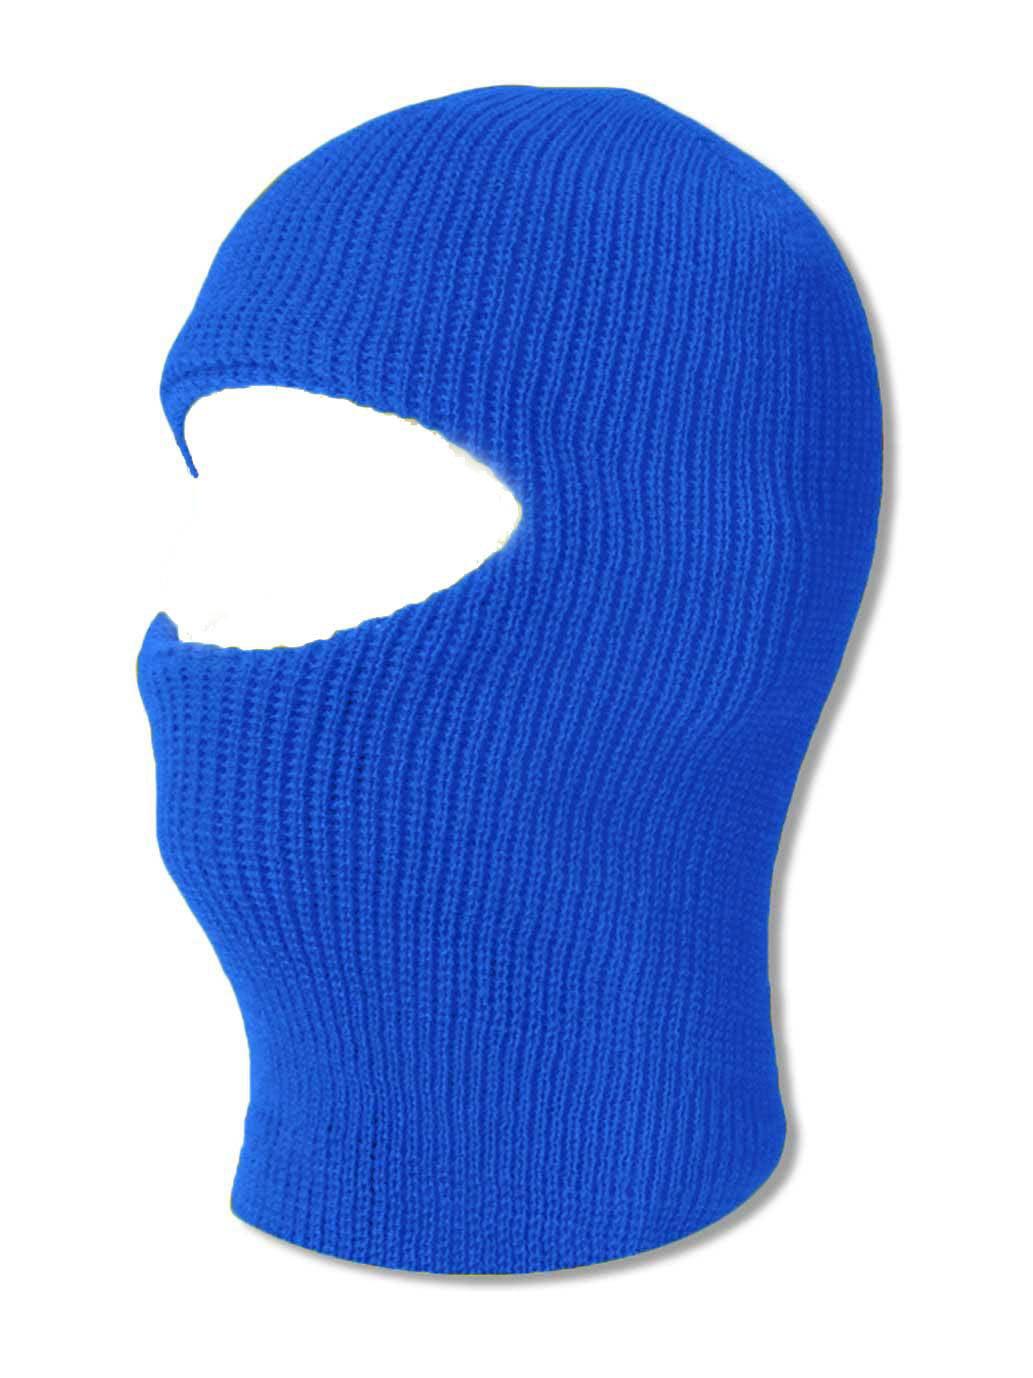 TopHeadwear Face Ski Mask 1 Hole Royal by TOP HEADWEAR